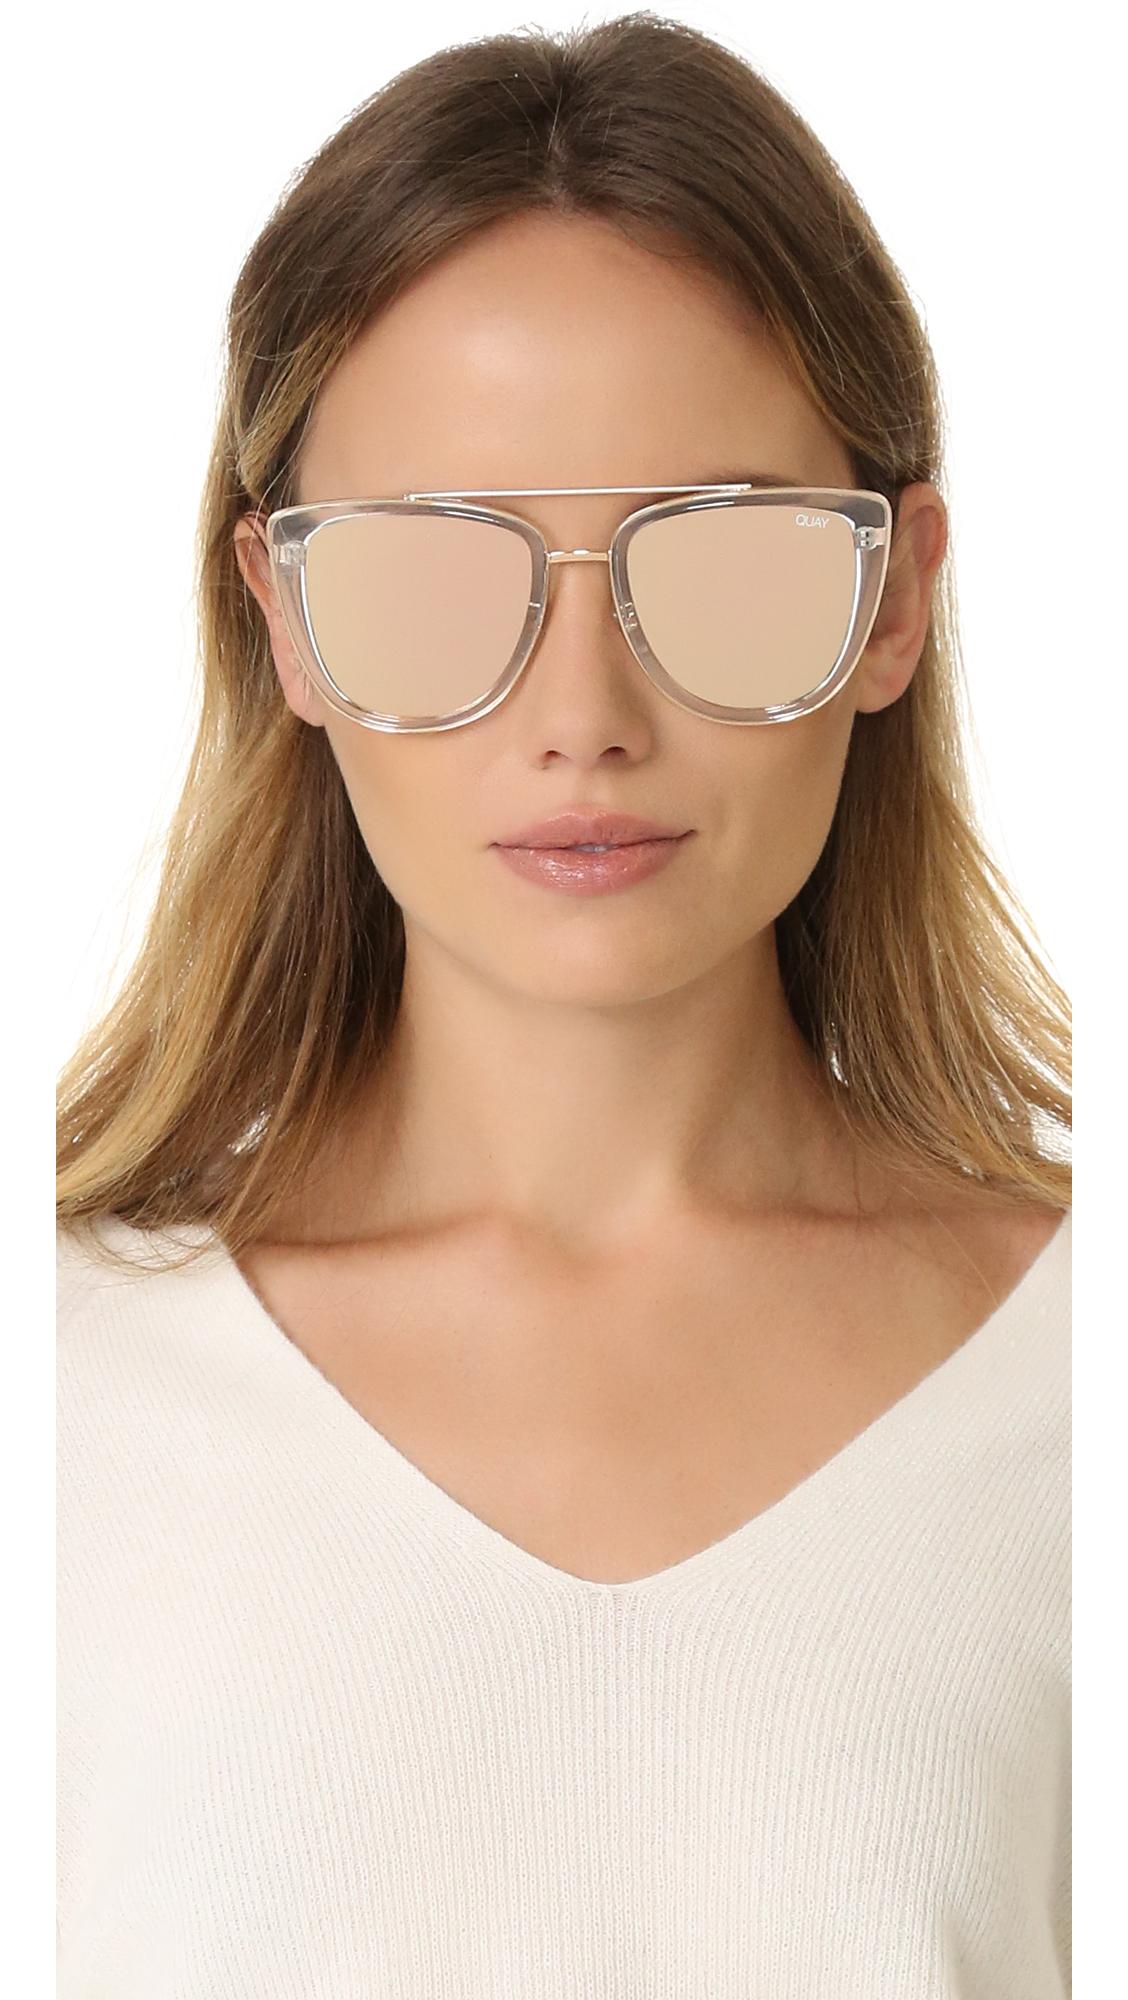 4f9c21e64a39e Quay French Kiss Sunglasses